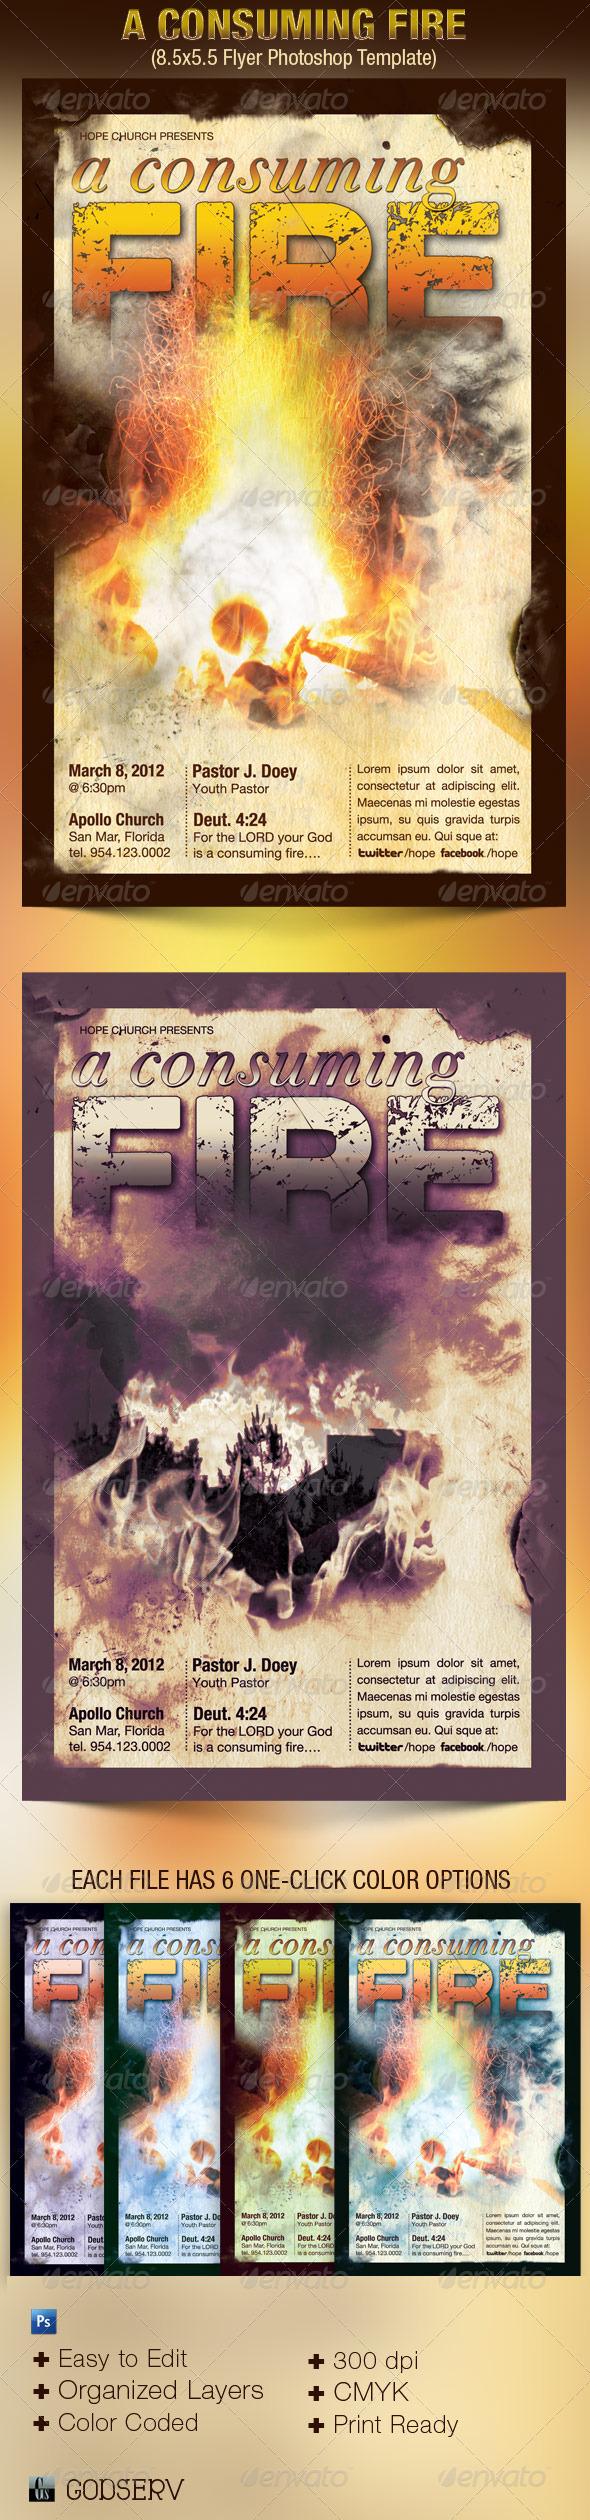 Consuming Fire Church Flyer Template - Church Flyers